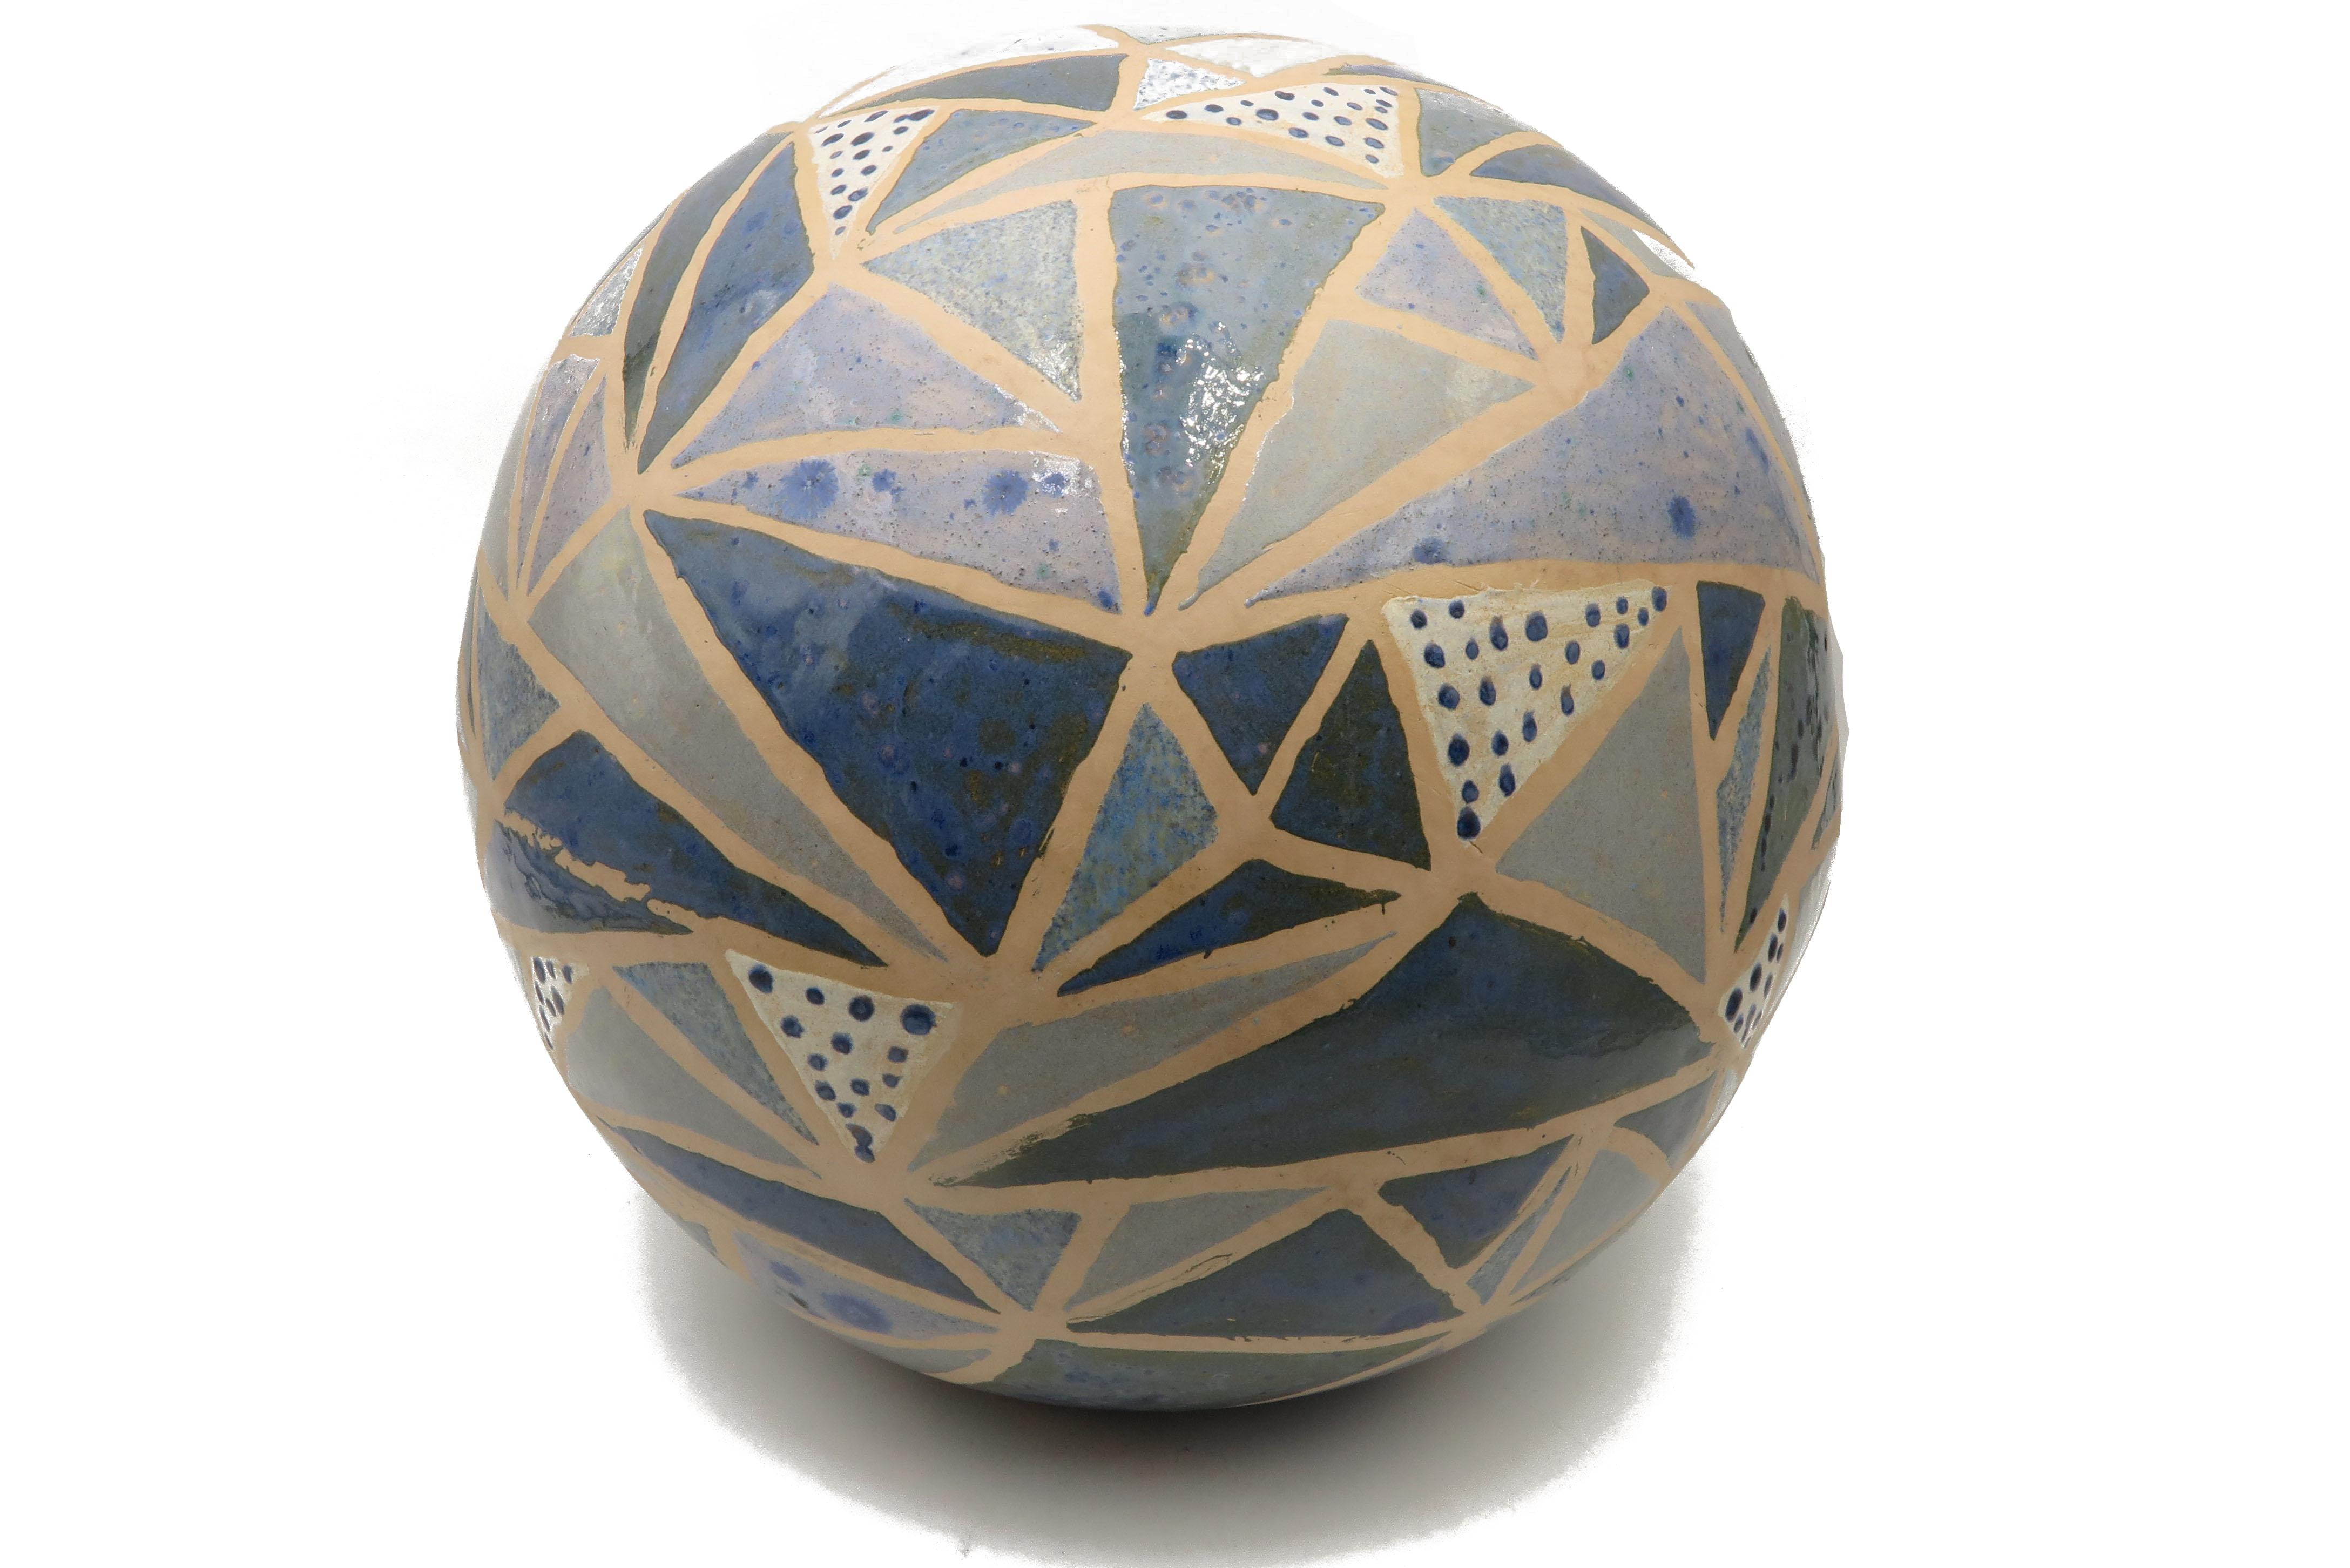 Kugel in Mosaikoptik, Blautönen  / L 28 cm